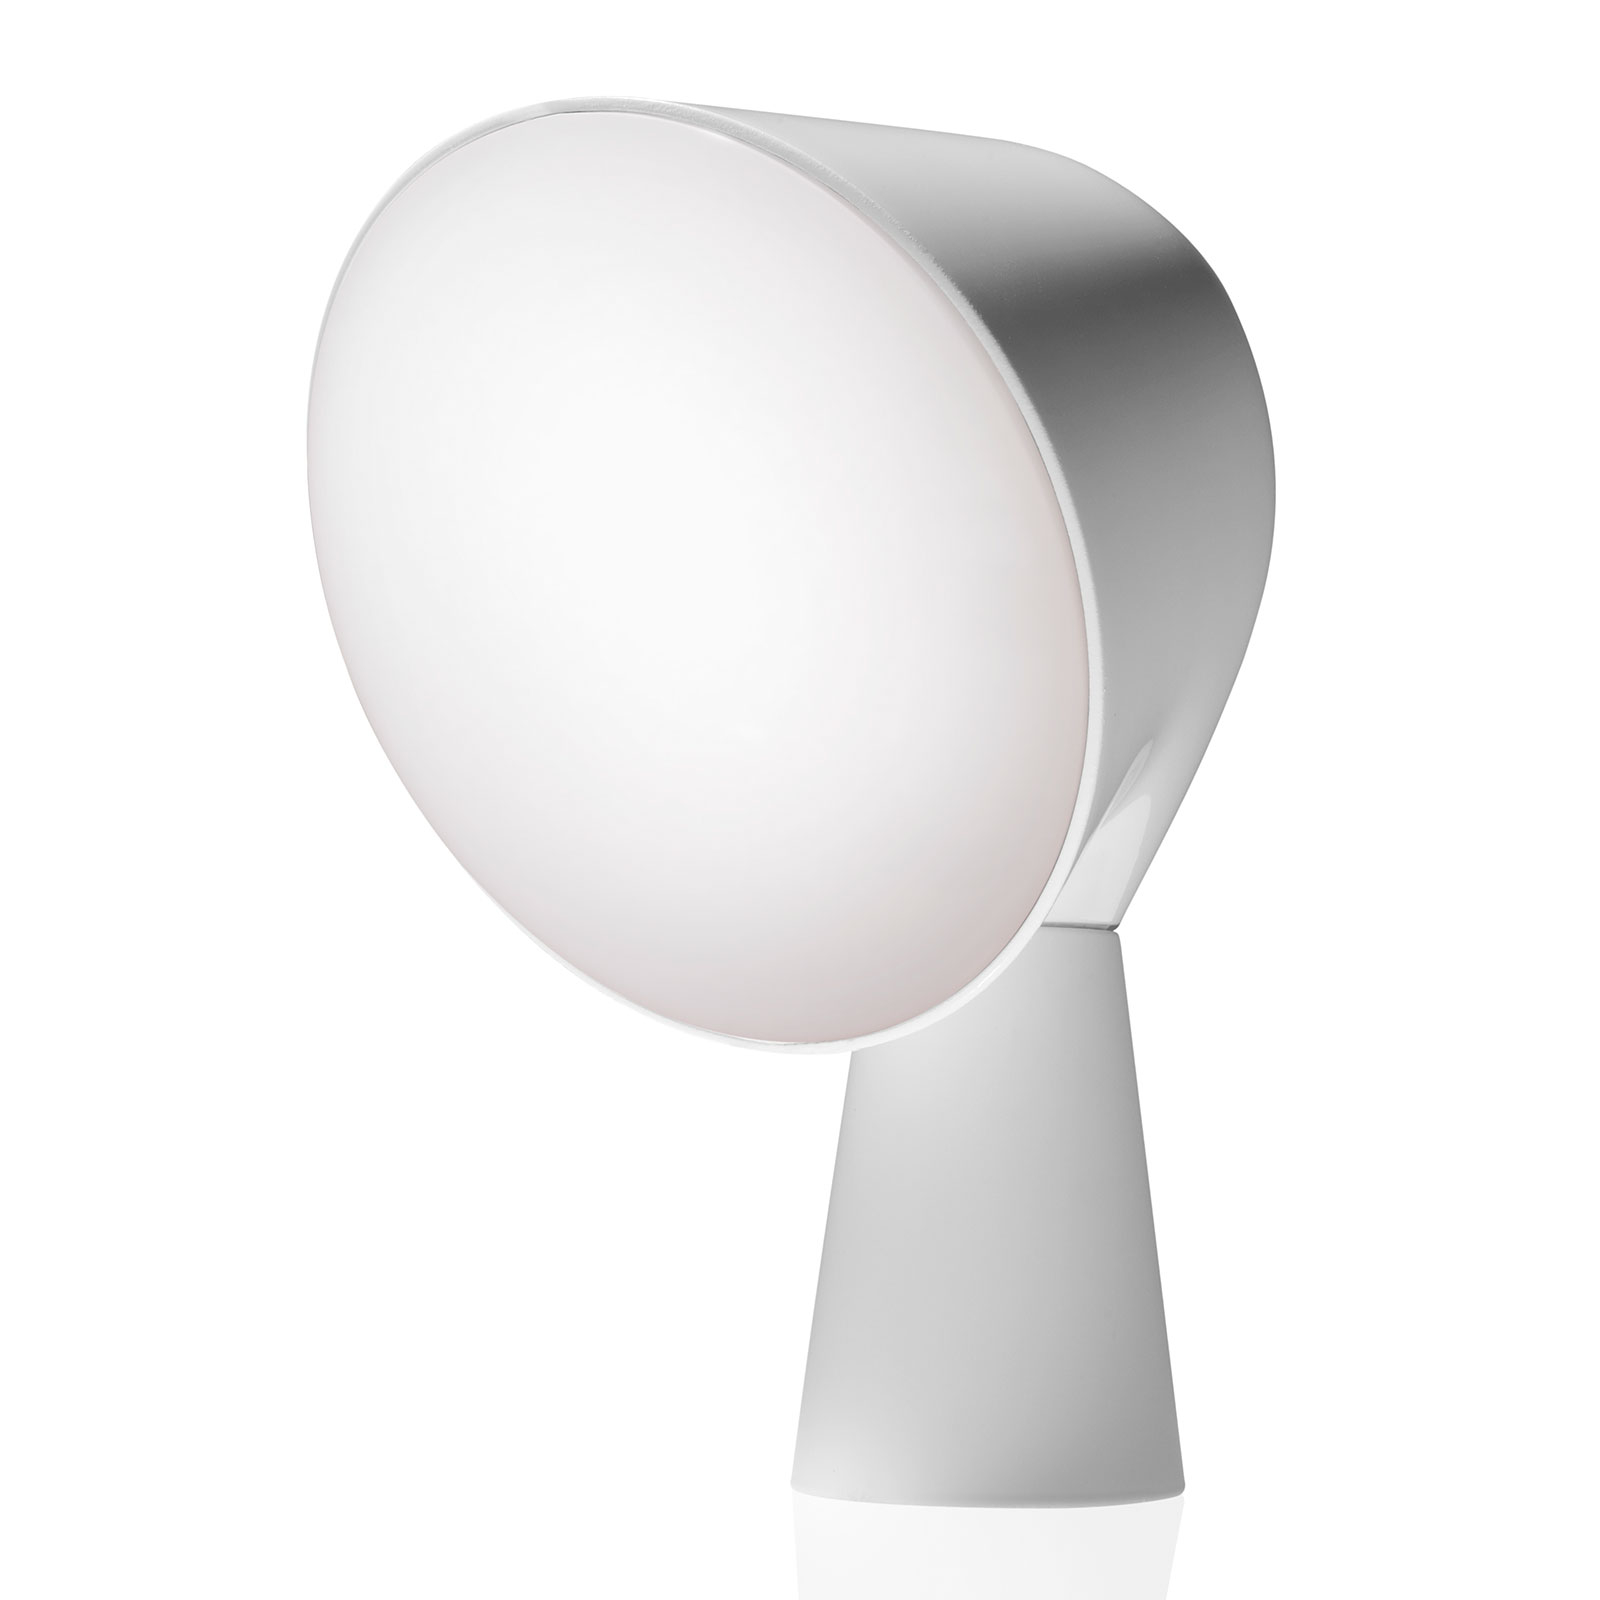 Foscarini Binic designerska lampa stołowa, biała